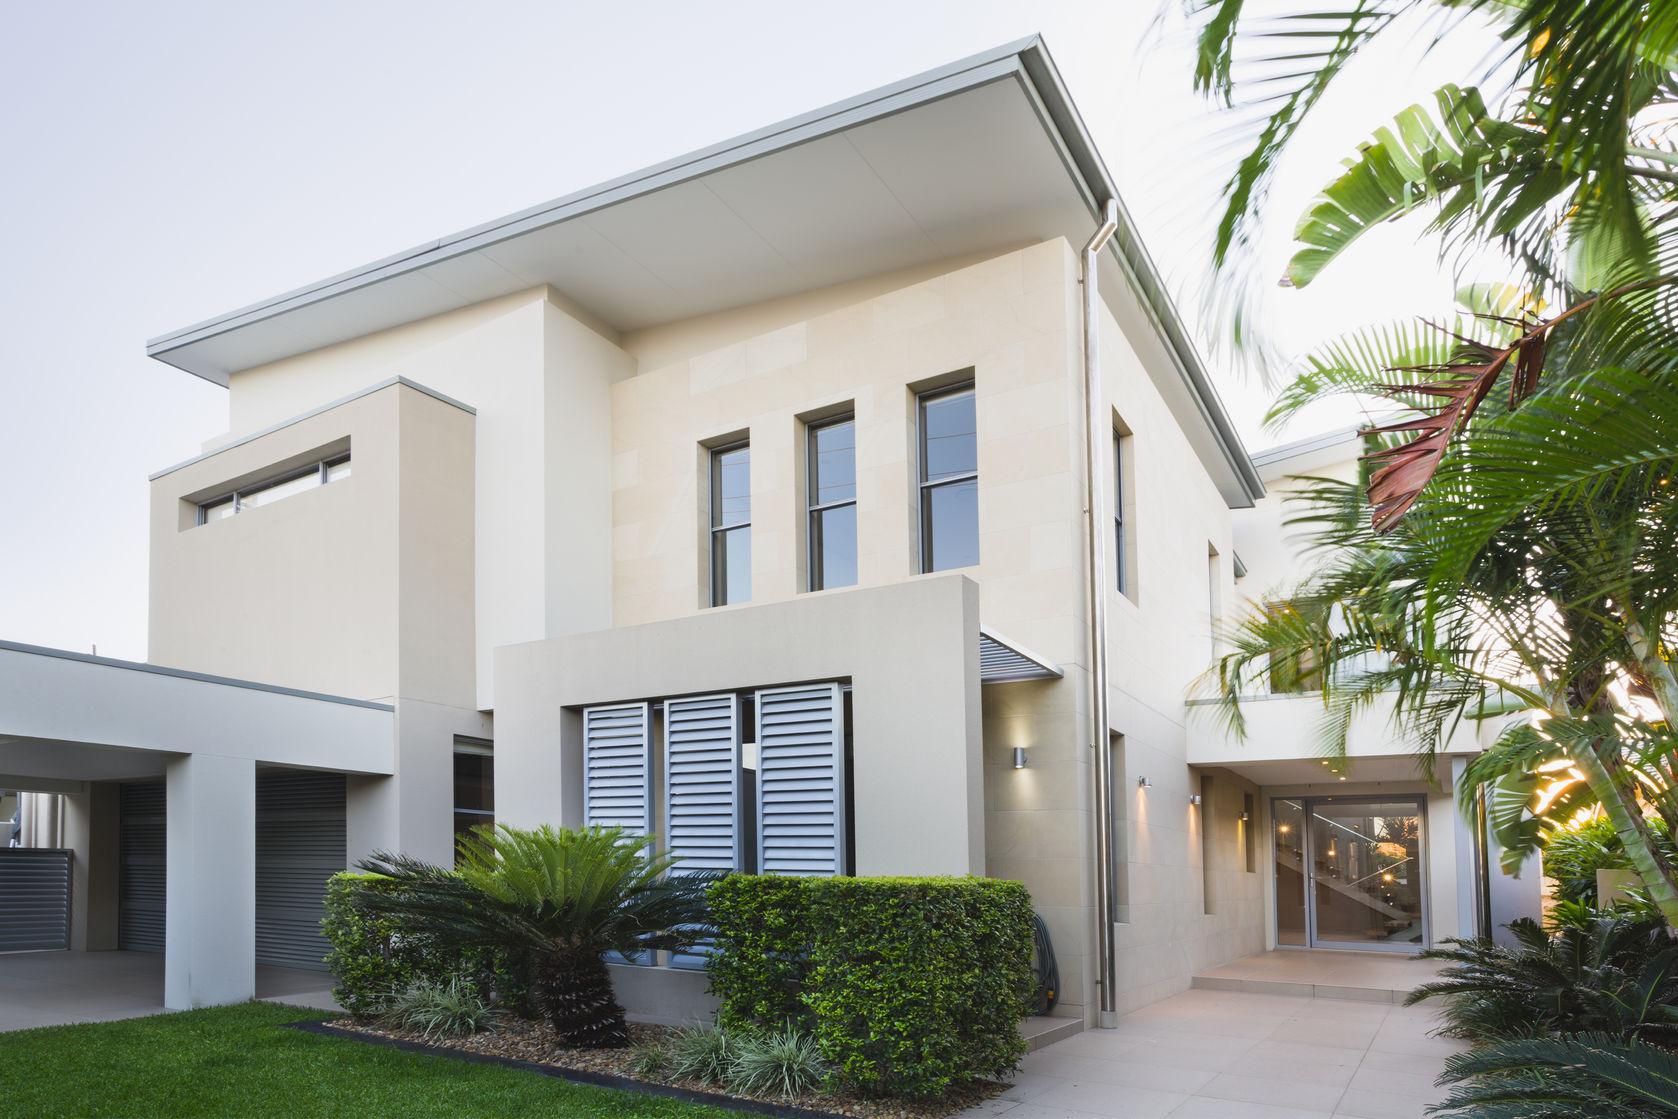 Villa mit Carport